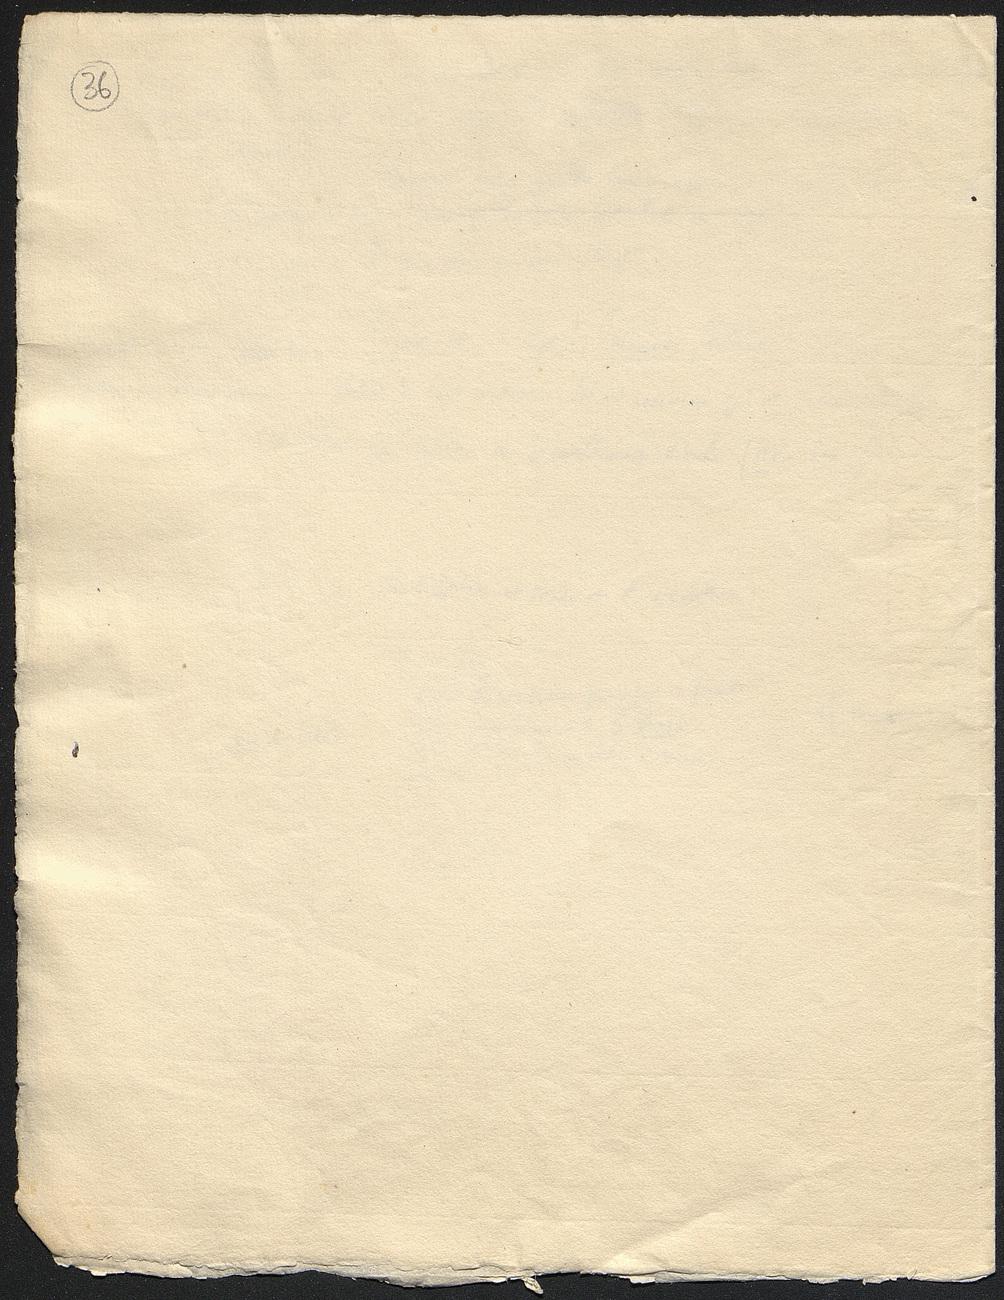 [folio 36 : foliotation de la main de bibliothécaire]